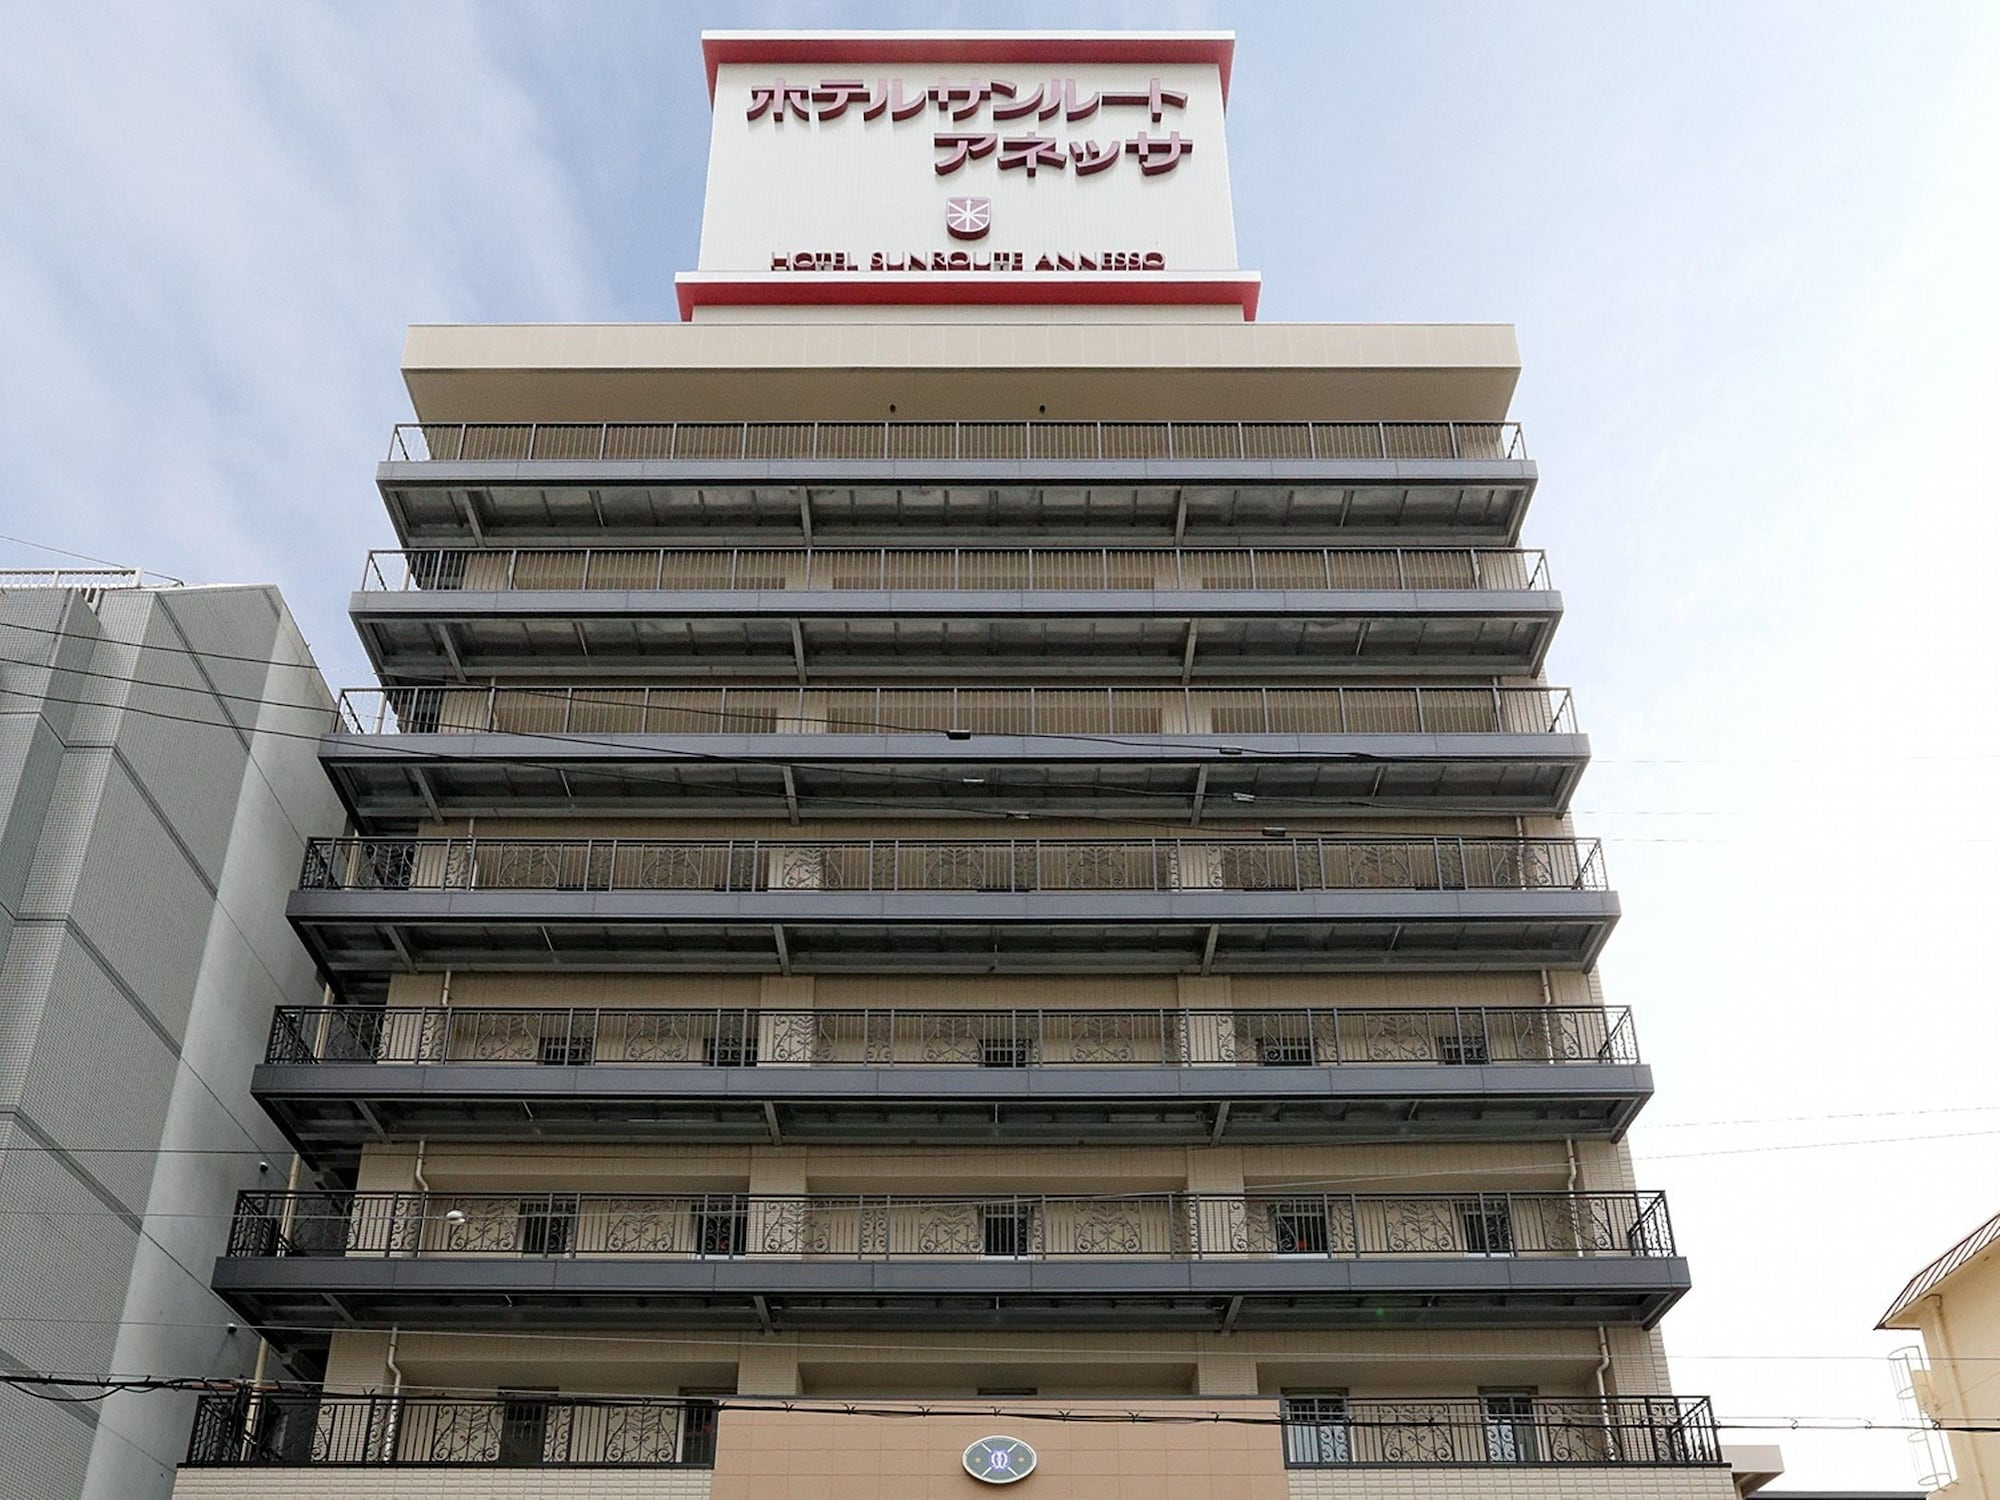 Hotel Sunroute Sopra Kobe Annesso, Kobe